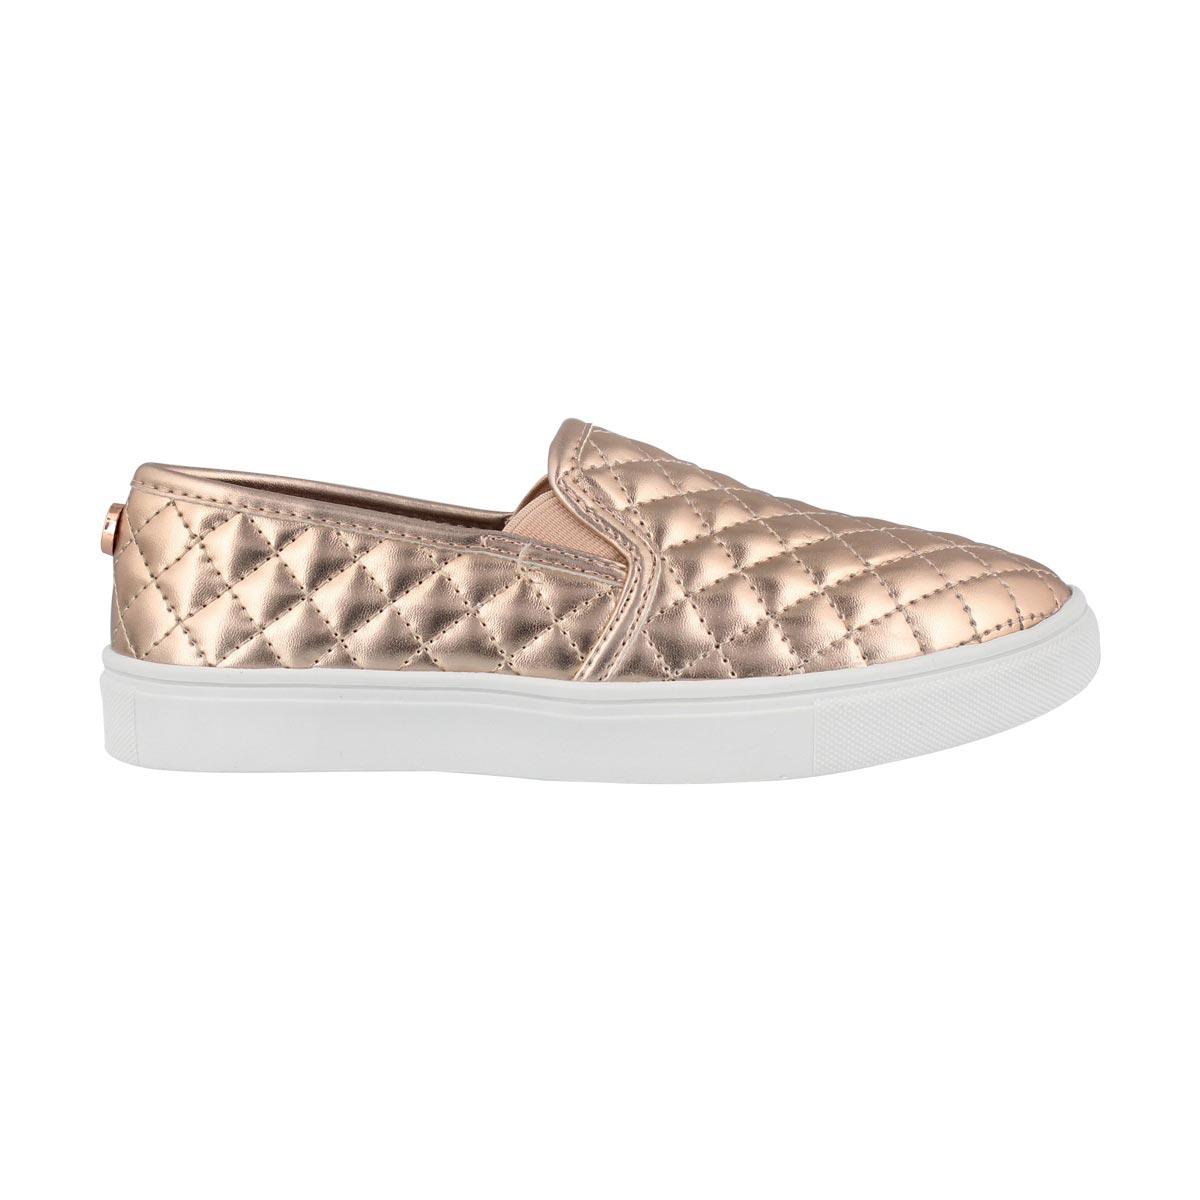 Grls J Ecentrcq rose gold casual slip on